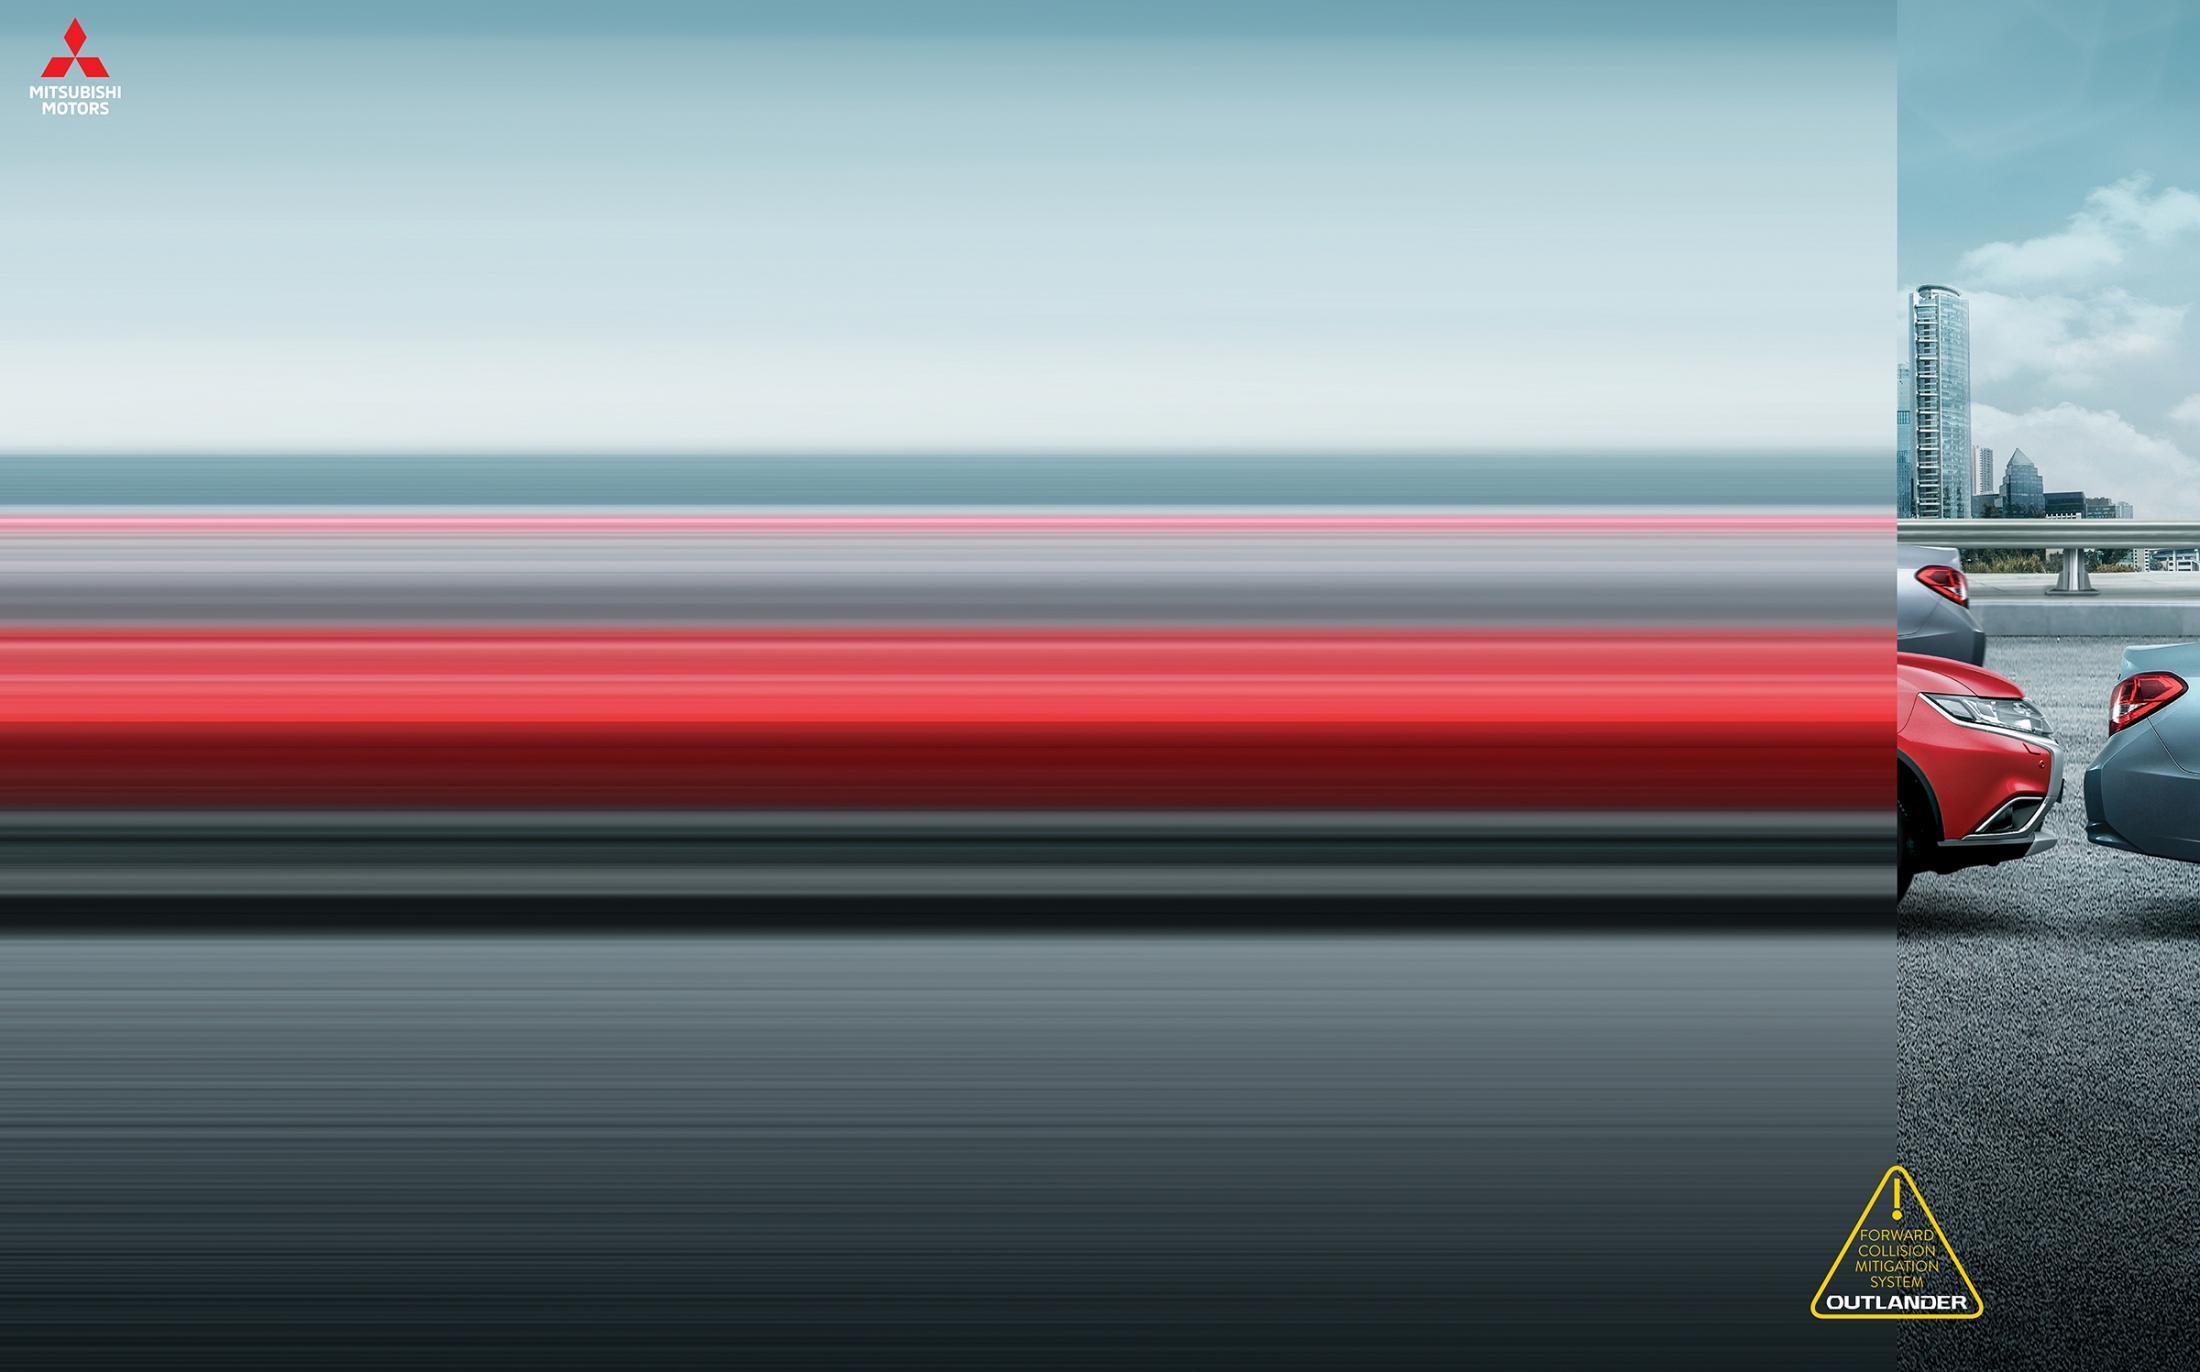 Mitsubishi Print Ad - Forward Collision Mitigation System, 1